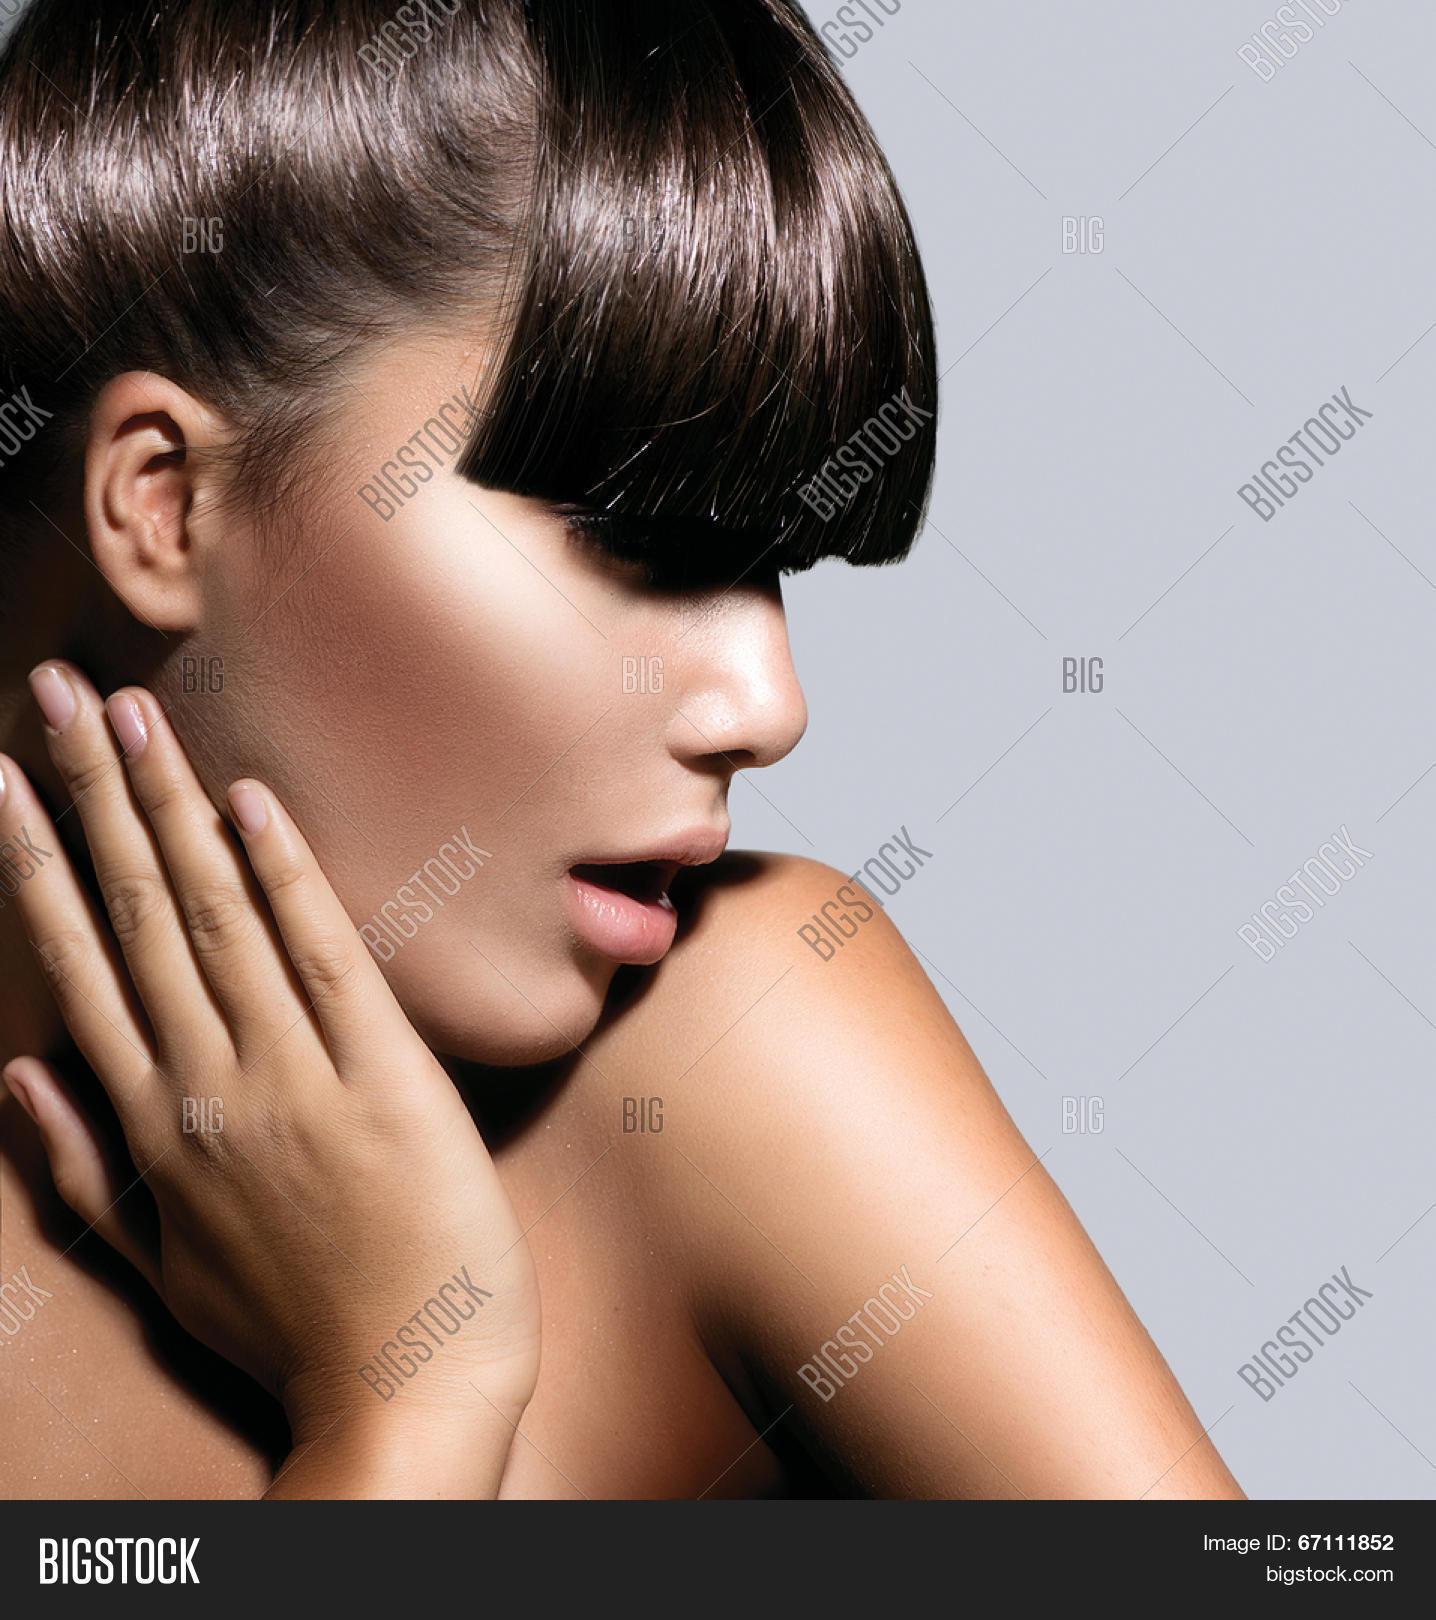 Fringe Fashion Model Image Photo Free Trial Bigstock